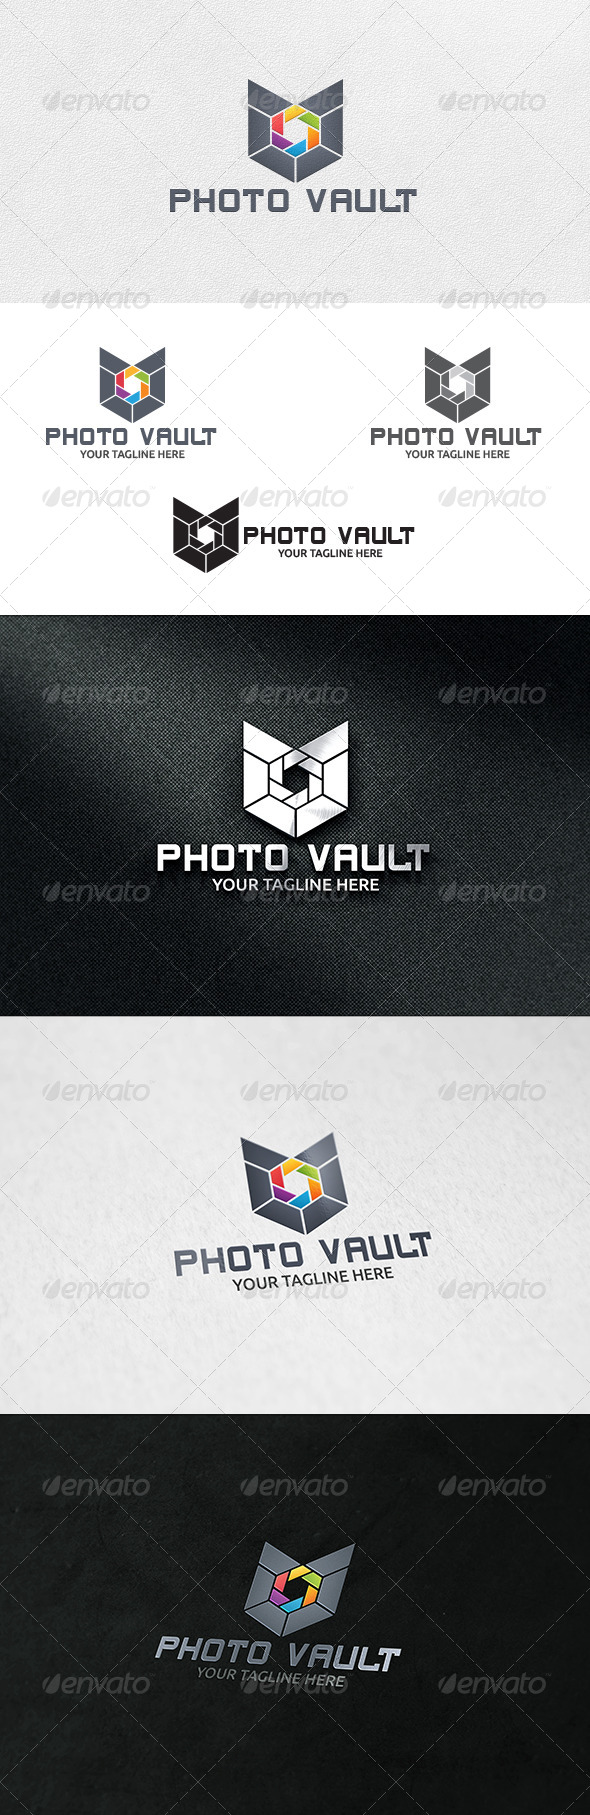 Photo Vault - Logo Template